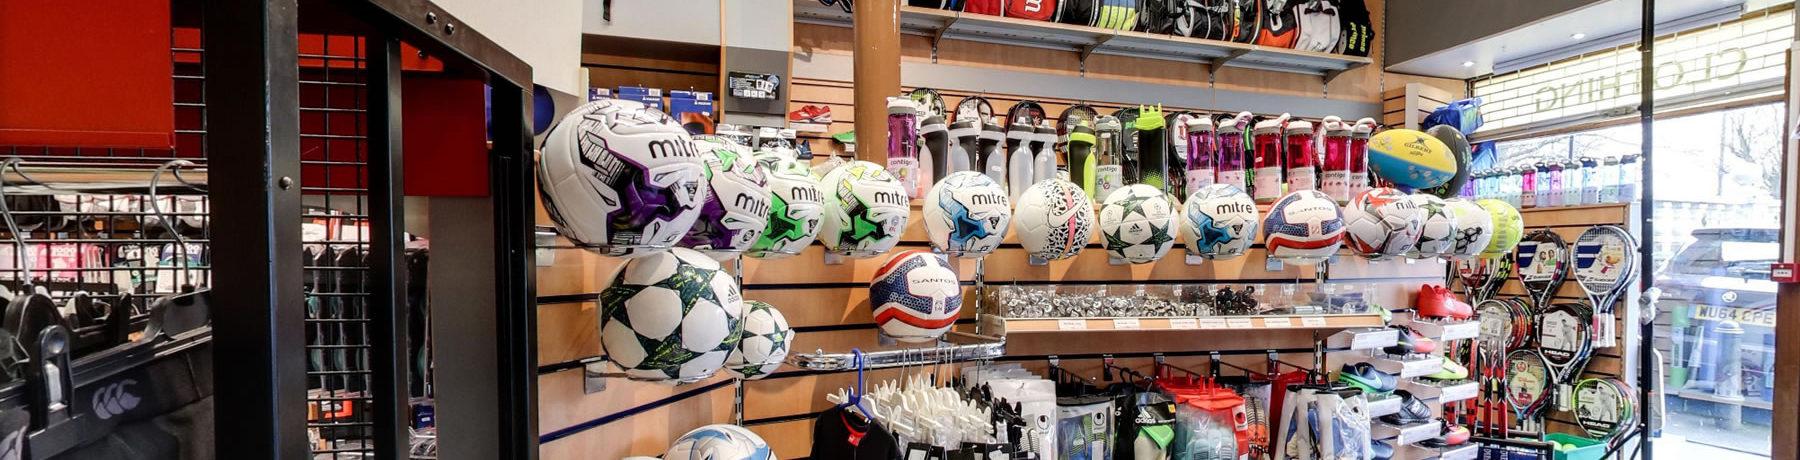 banner-shop-display-football